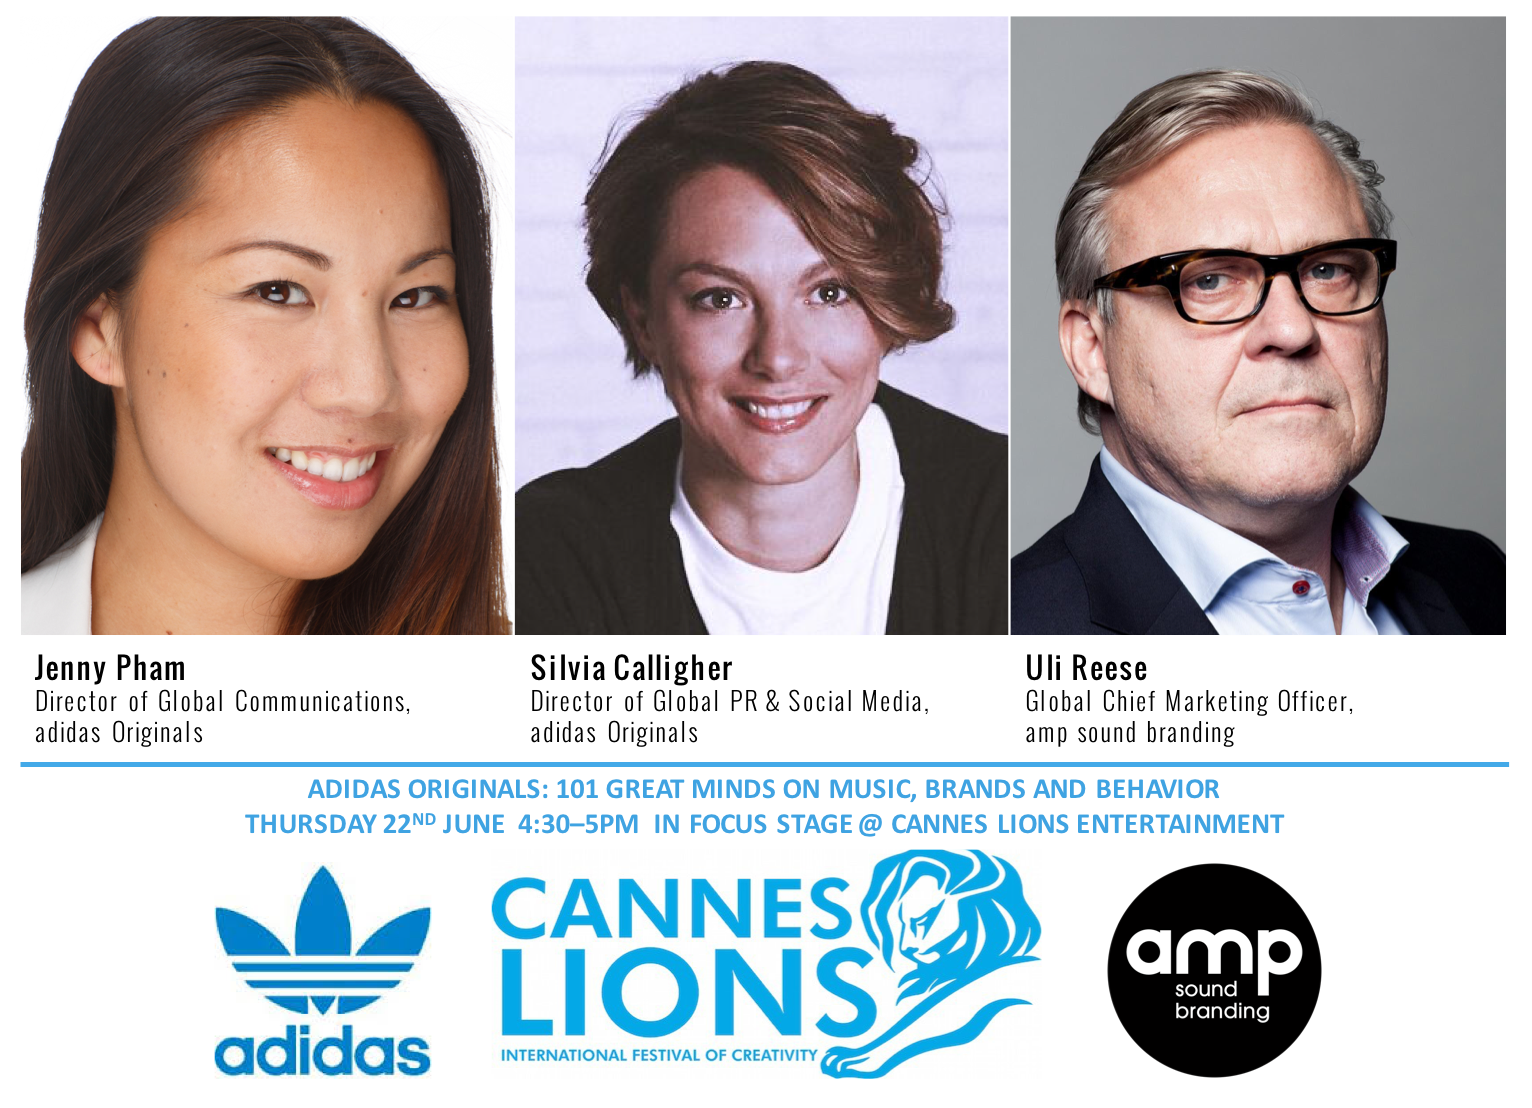 cannes lions 2017 adidas originals amp sound branding uli reese